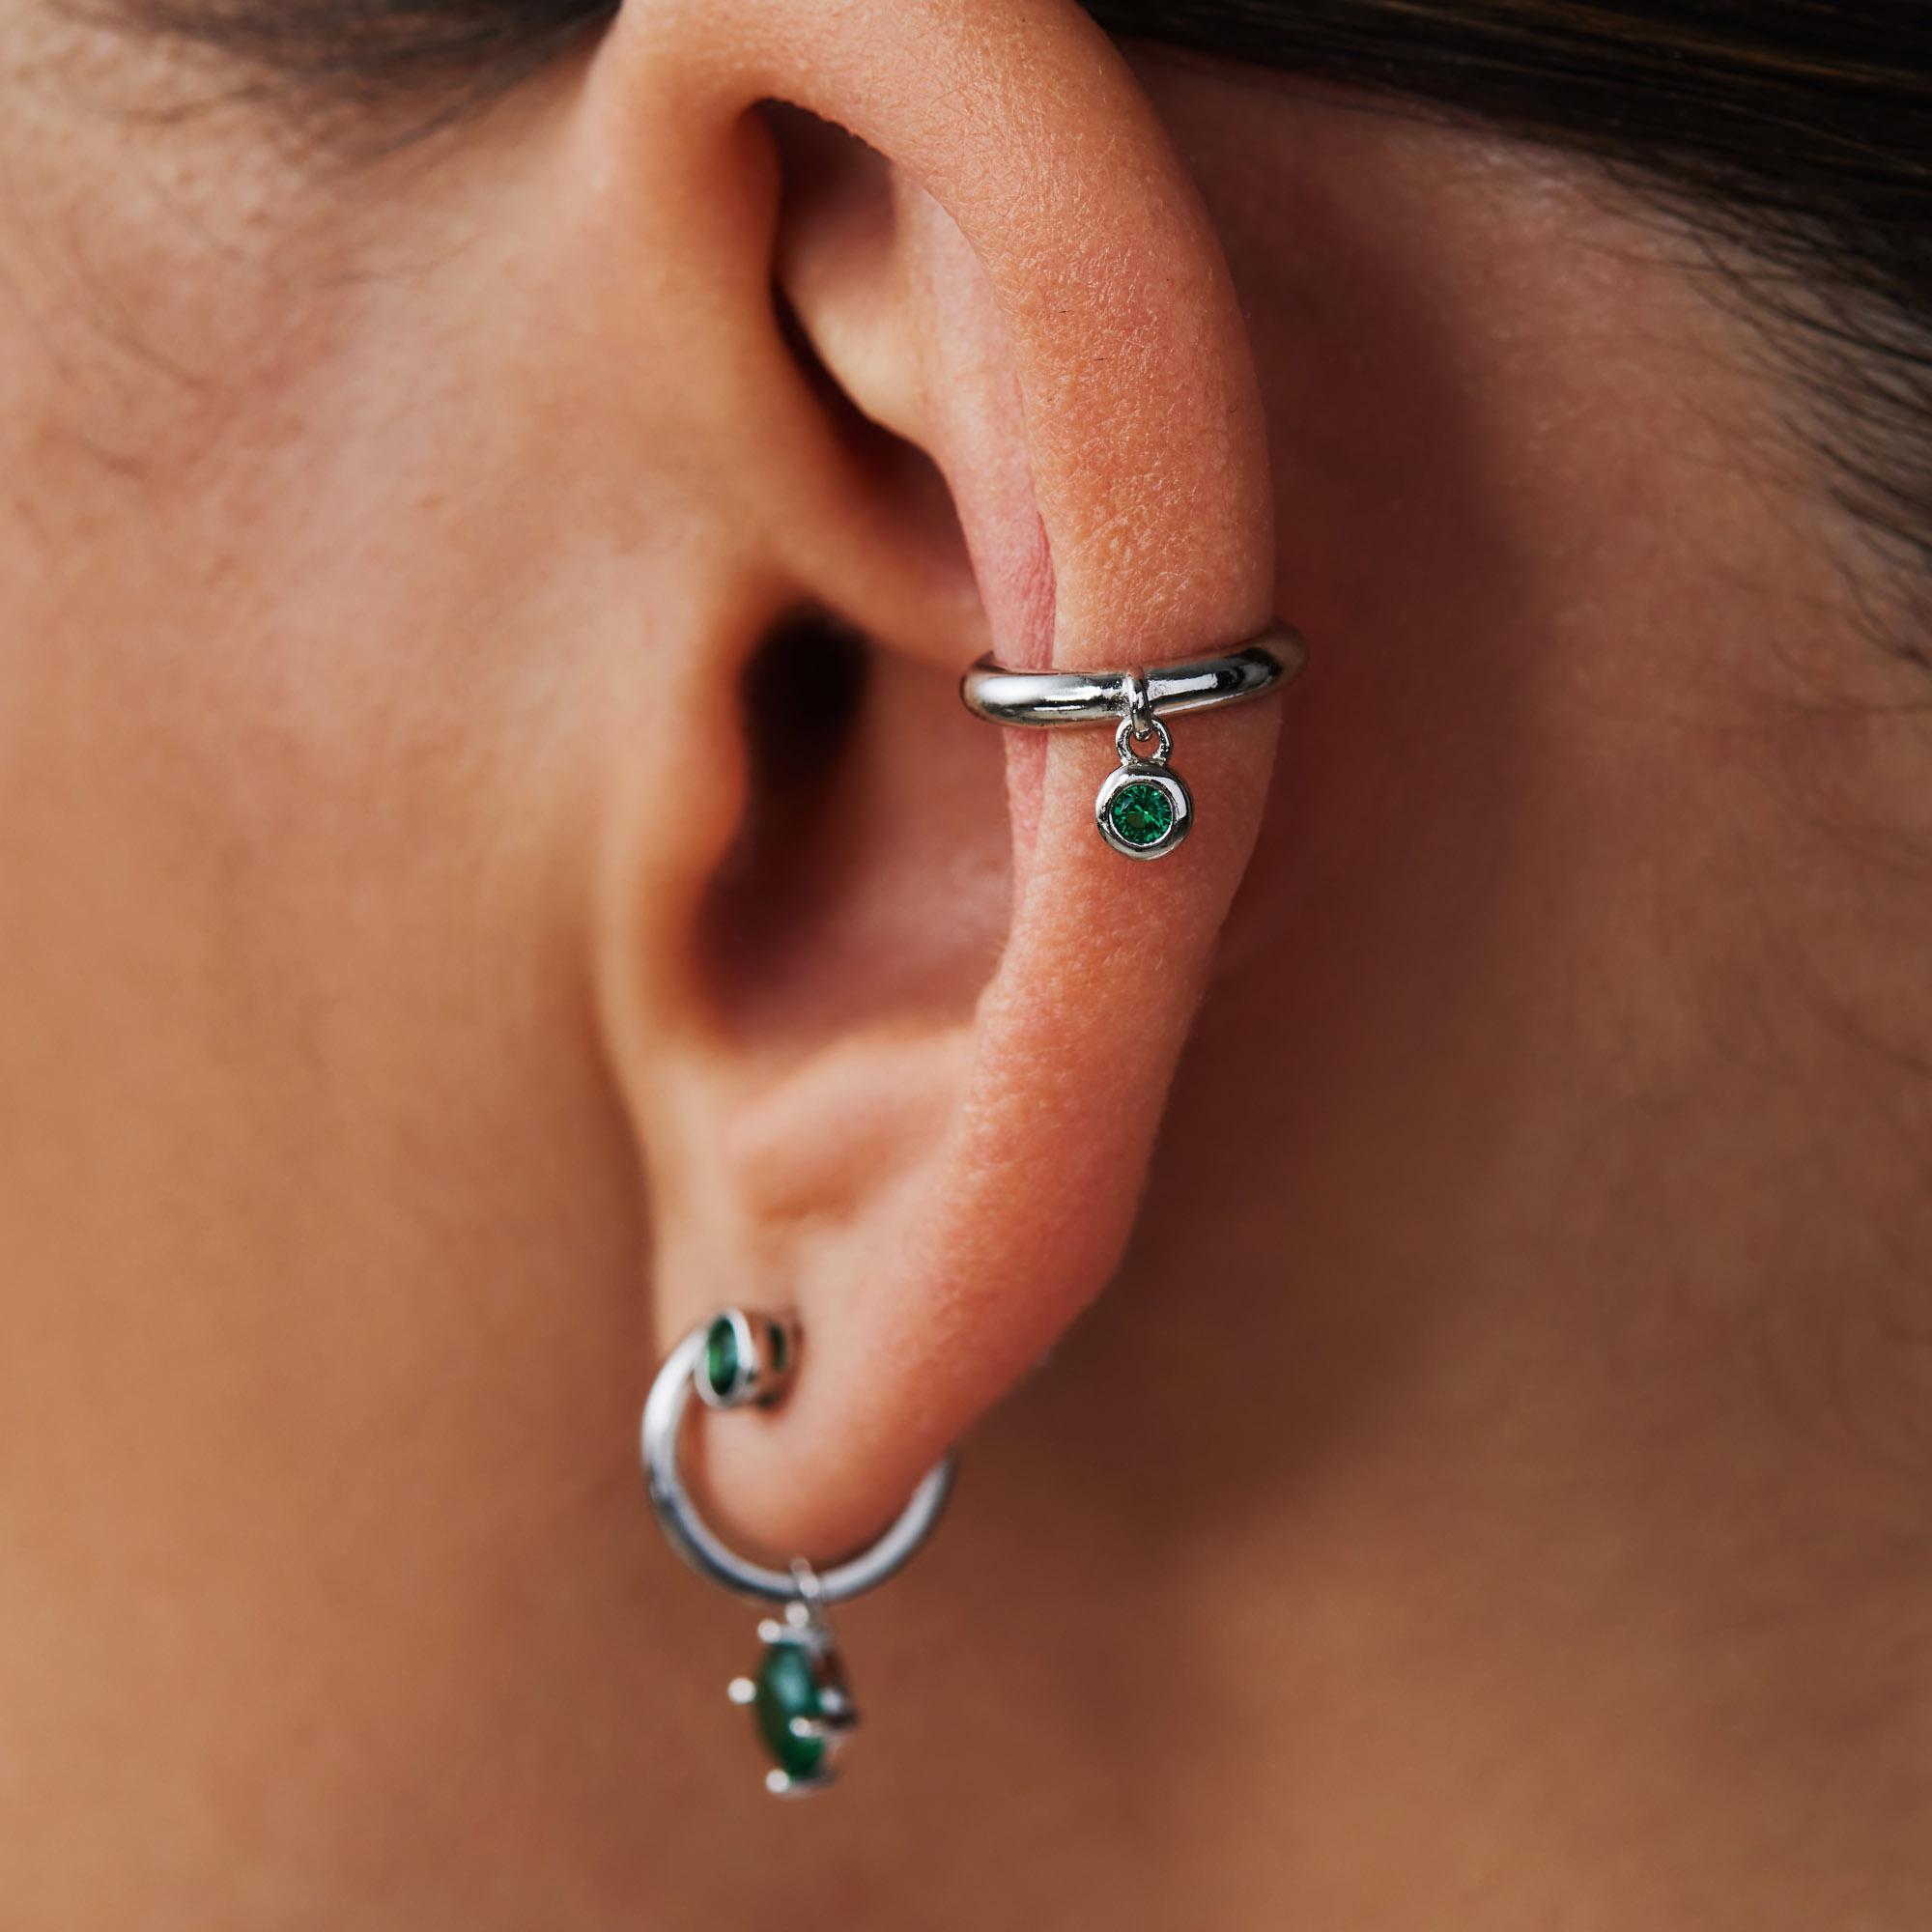 Violet Hamden Venus 925 sterling silver ear cuff with birthstone